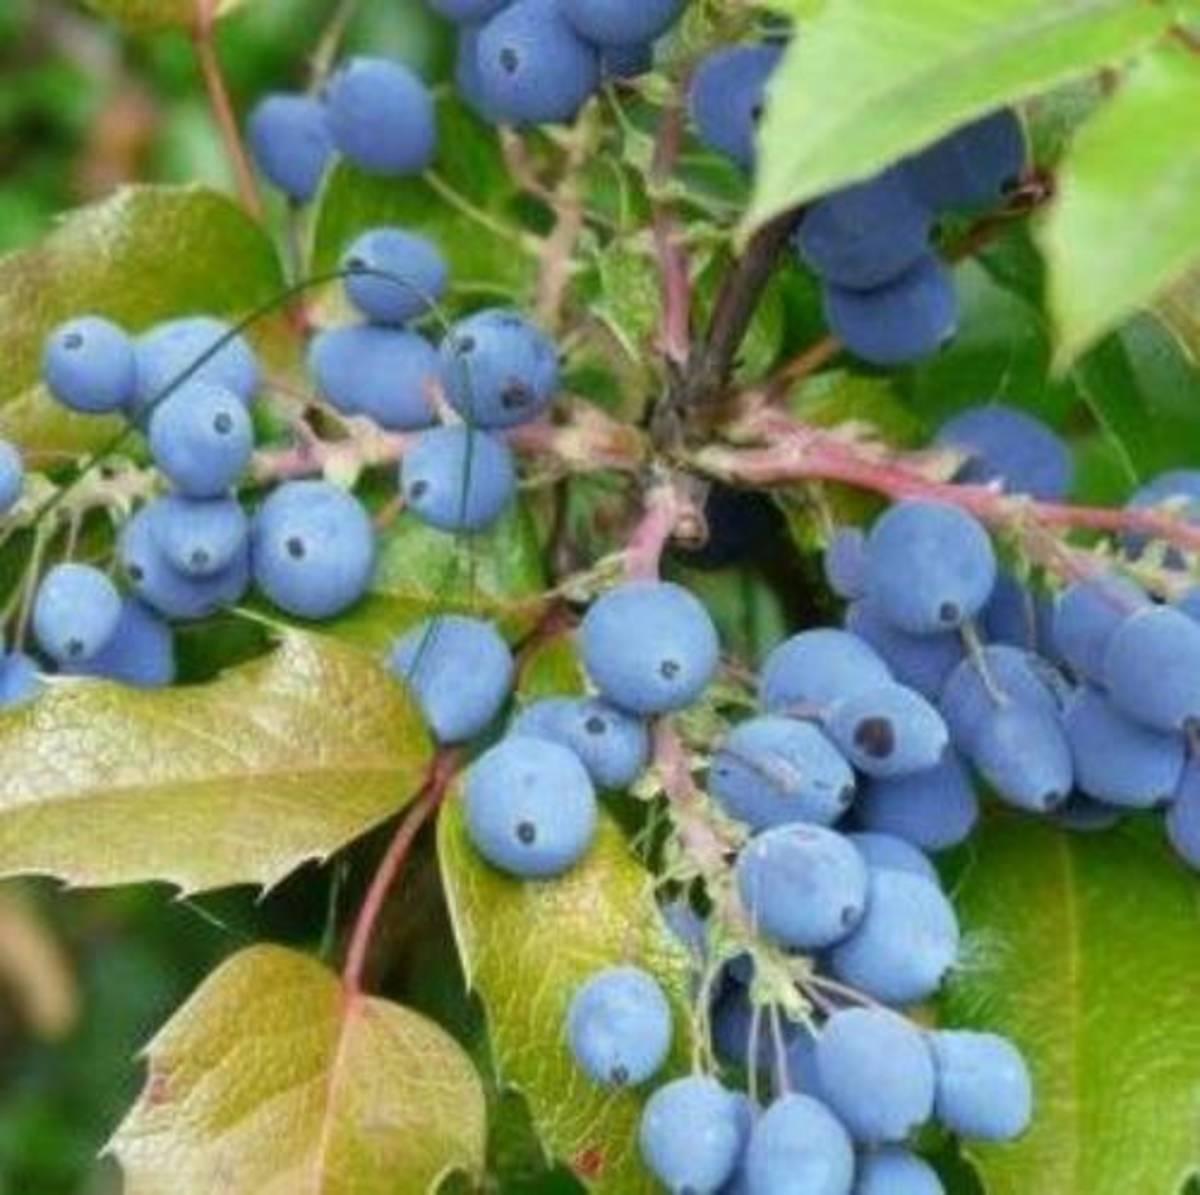 Showy, ornamental, native evergreen Oregon grape holly!